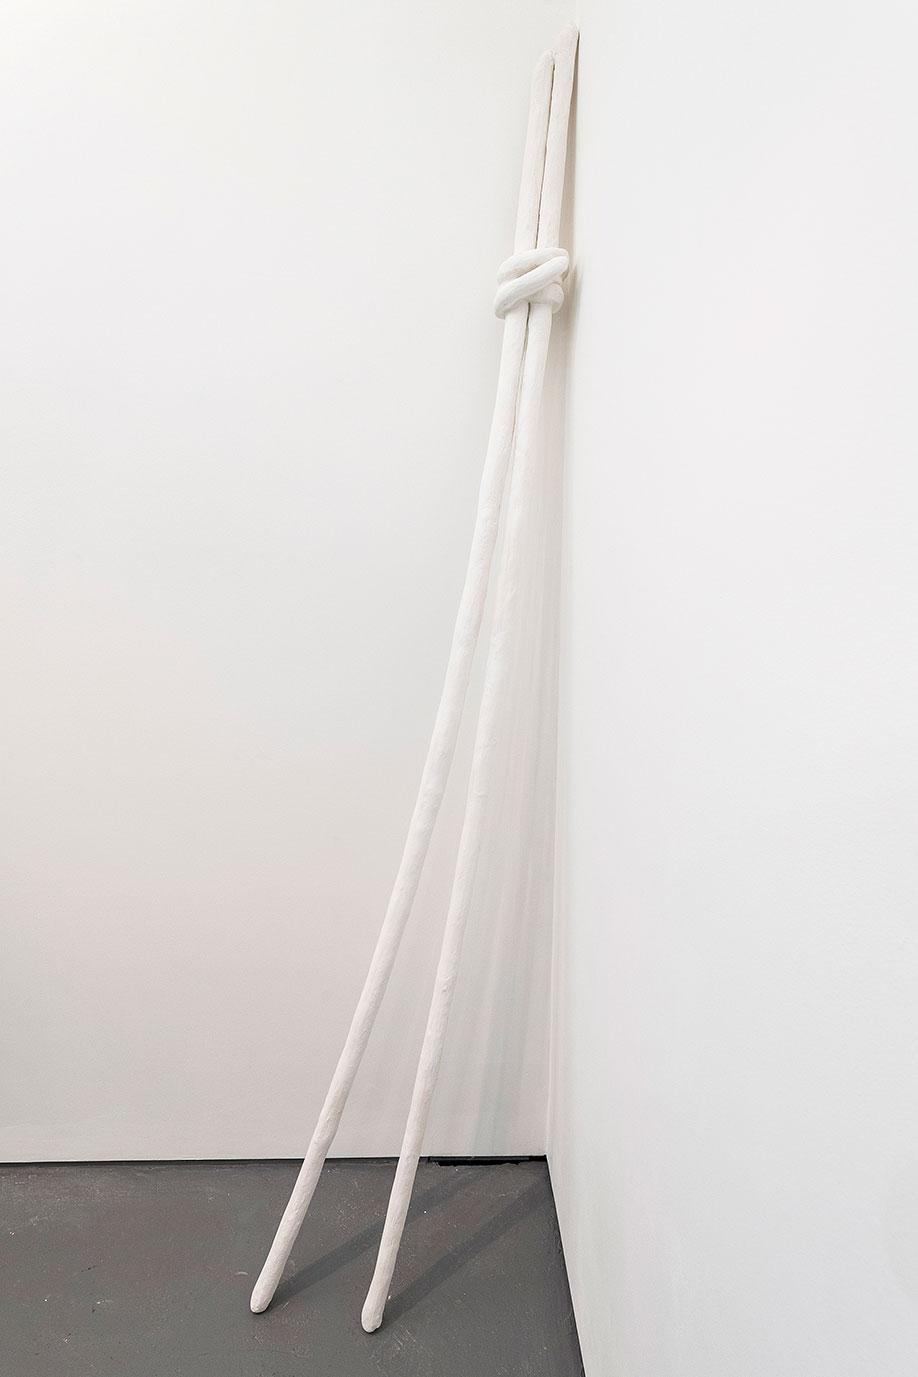 <b>Title:</b>Sticks Around<br /><b>Year:</b>2016<br /><b>Medium:</b>Plaster, hessian, wood and armature wire<br /><b>Size:</b>238cm x 27cm x 15cm